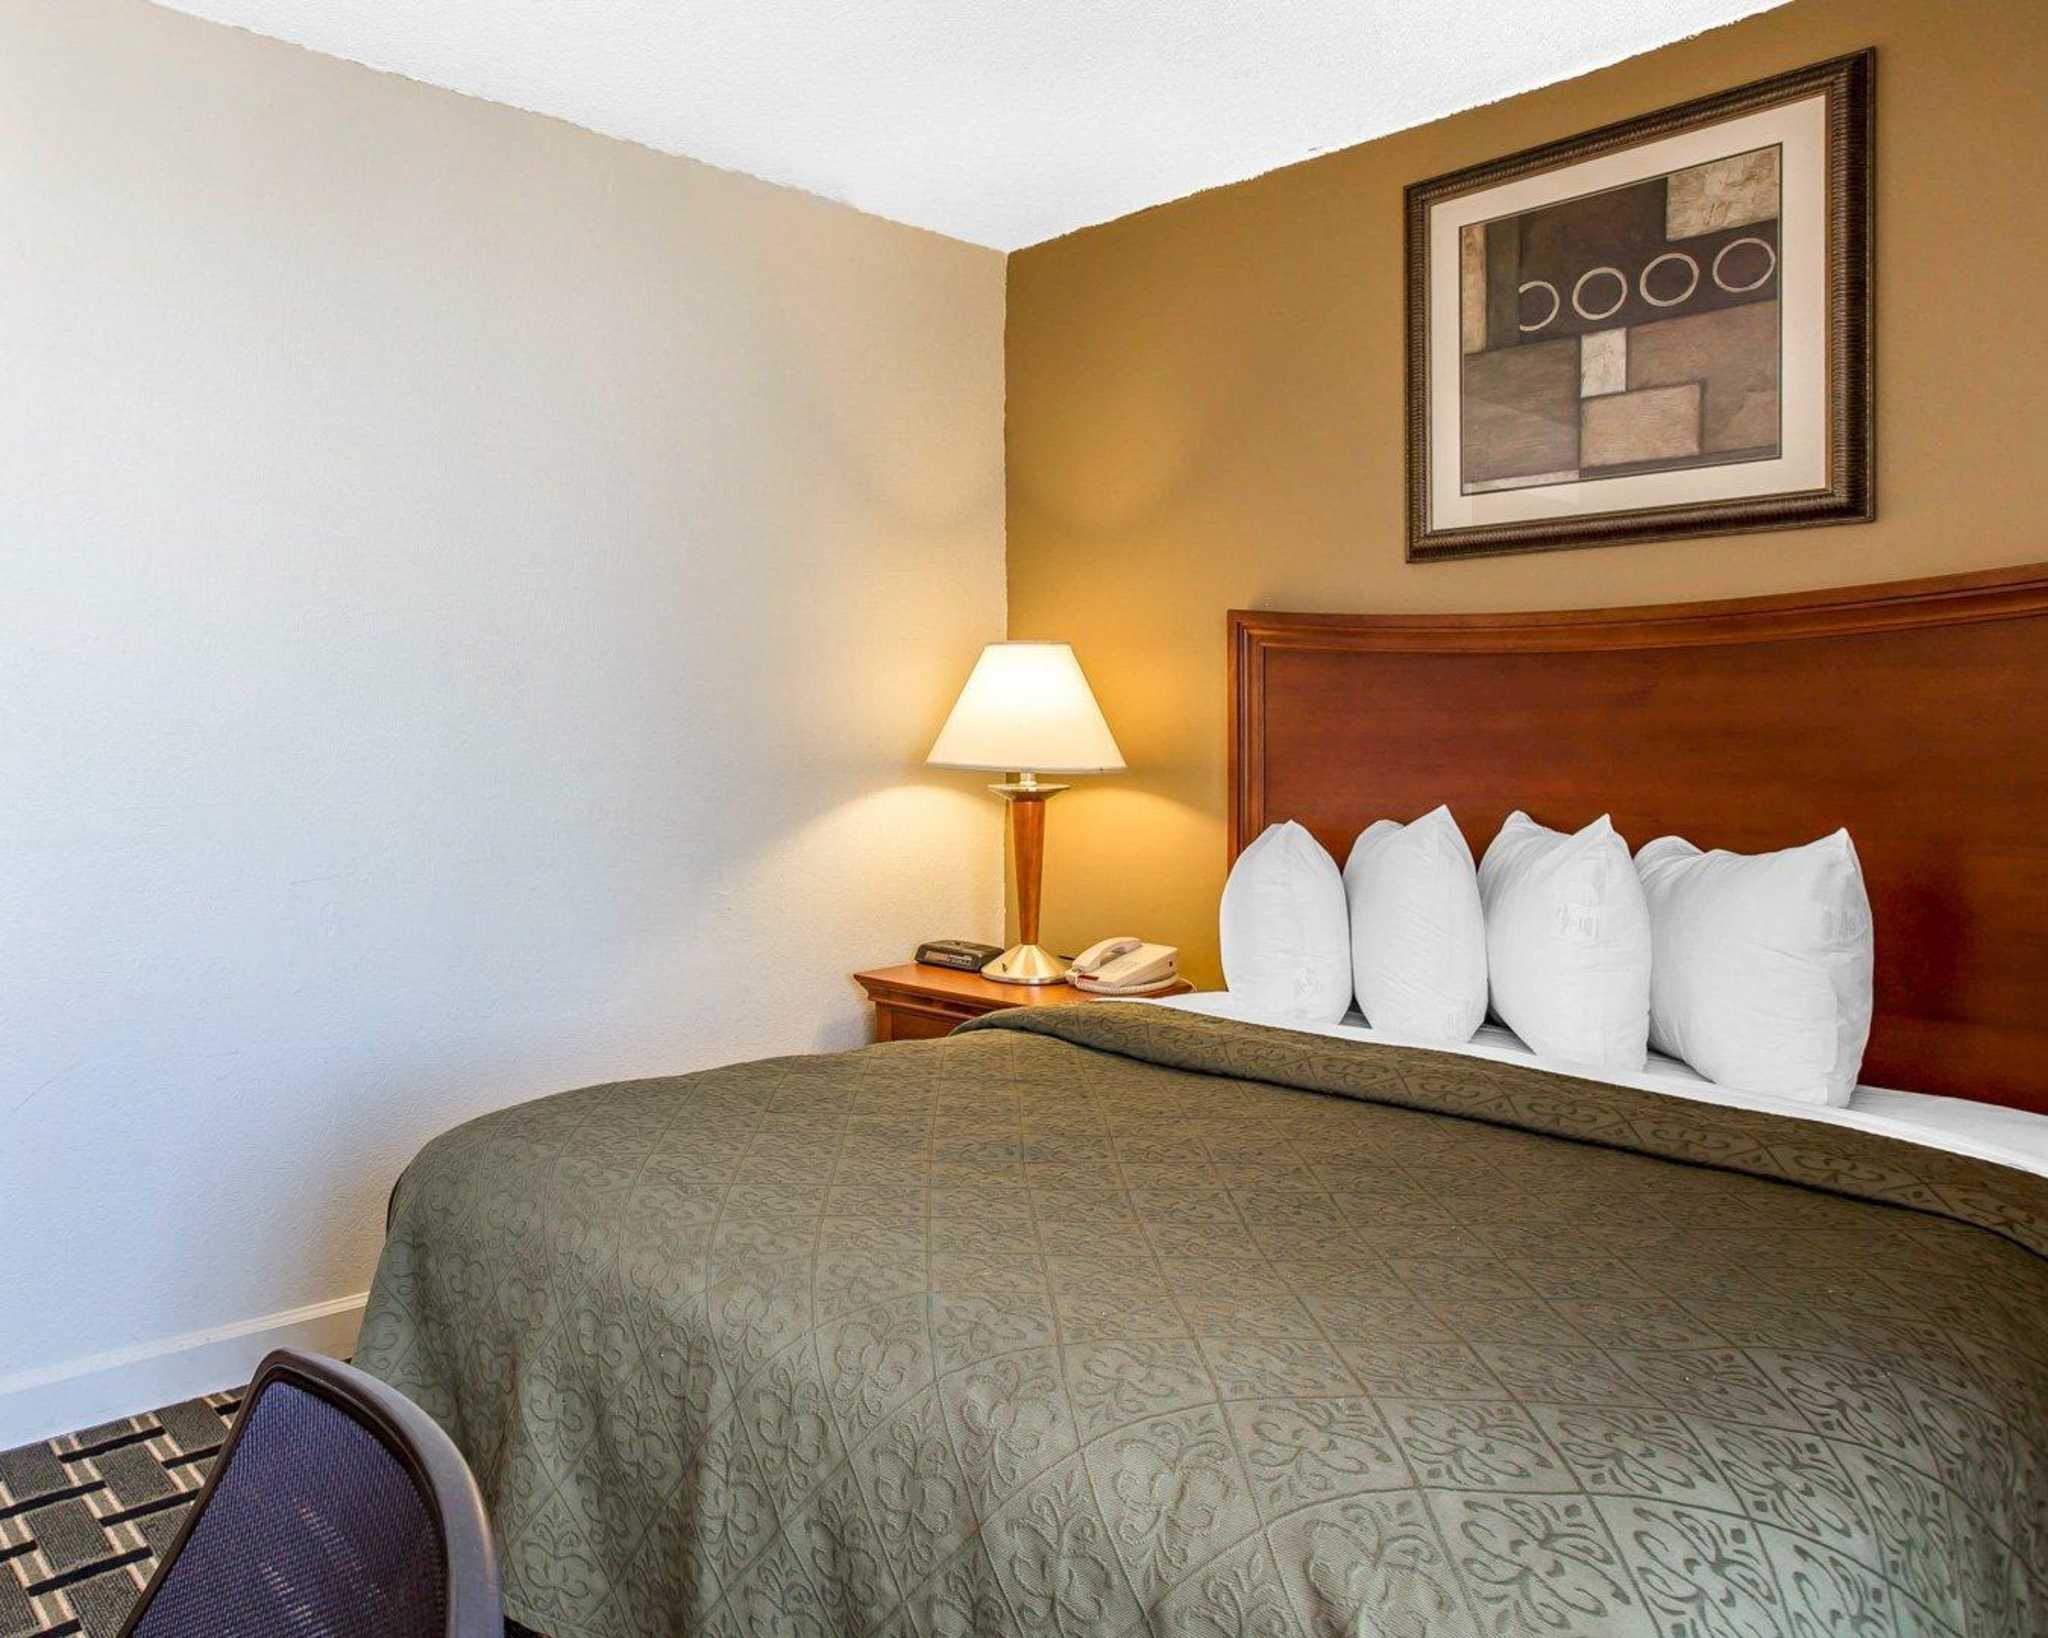 Myrtle Beach 3 Bedroom Suites Quality Inn Amp Suites Myrtle Beach South Carolina Sc